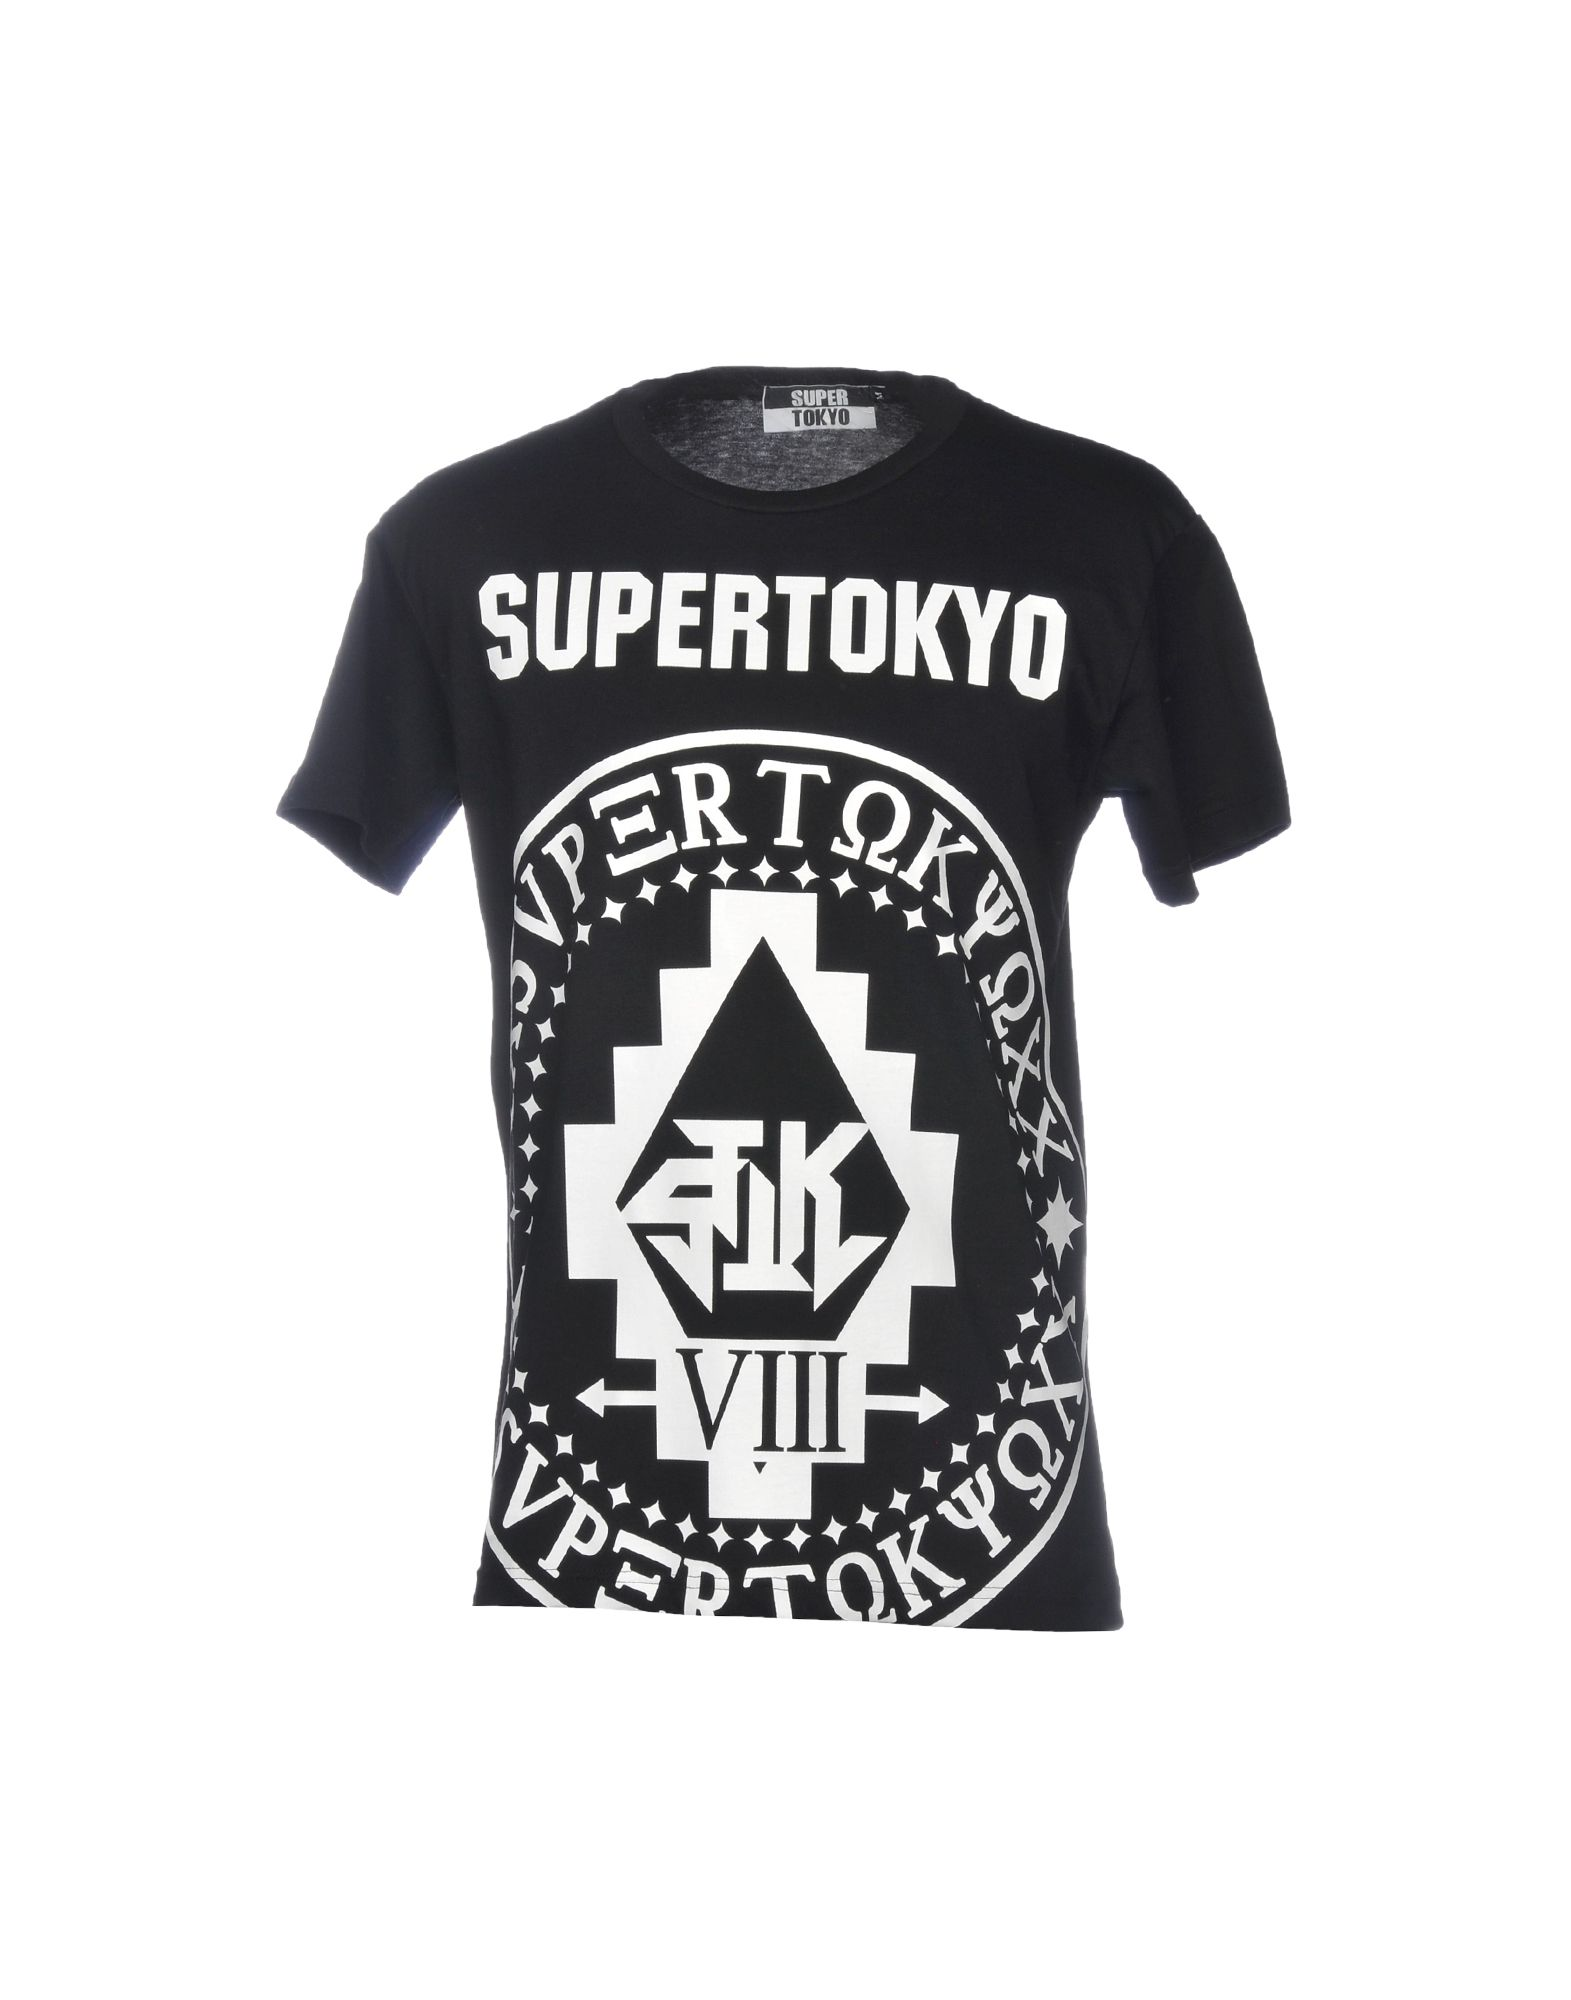 T-Shirt Stk Supertokyo Uomo Uomo Supertokyo - 12207479EL b76e46